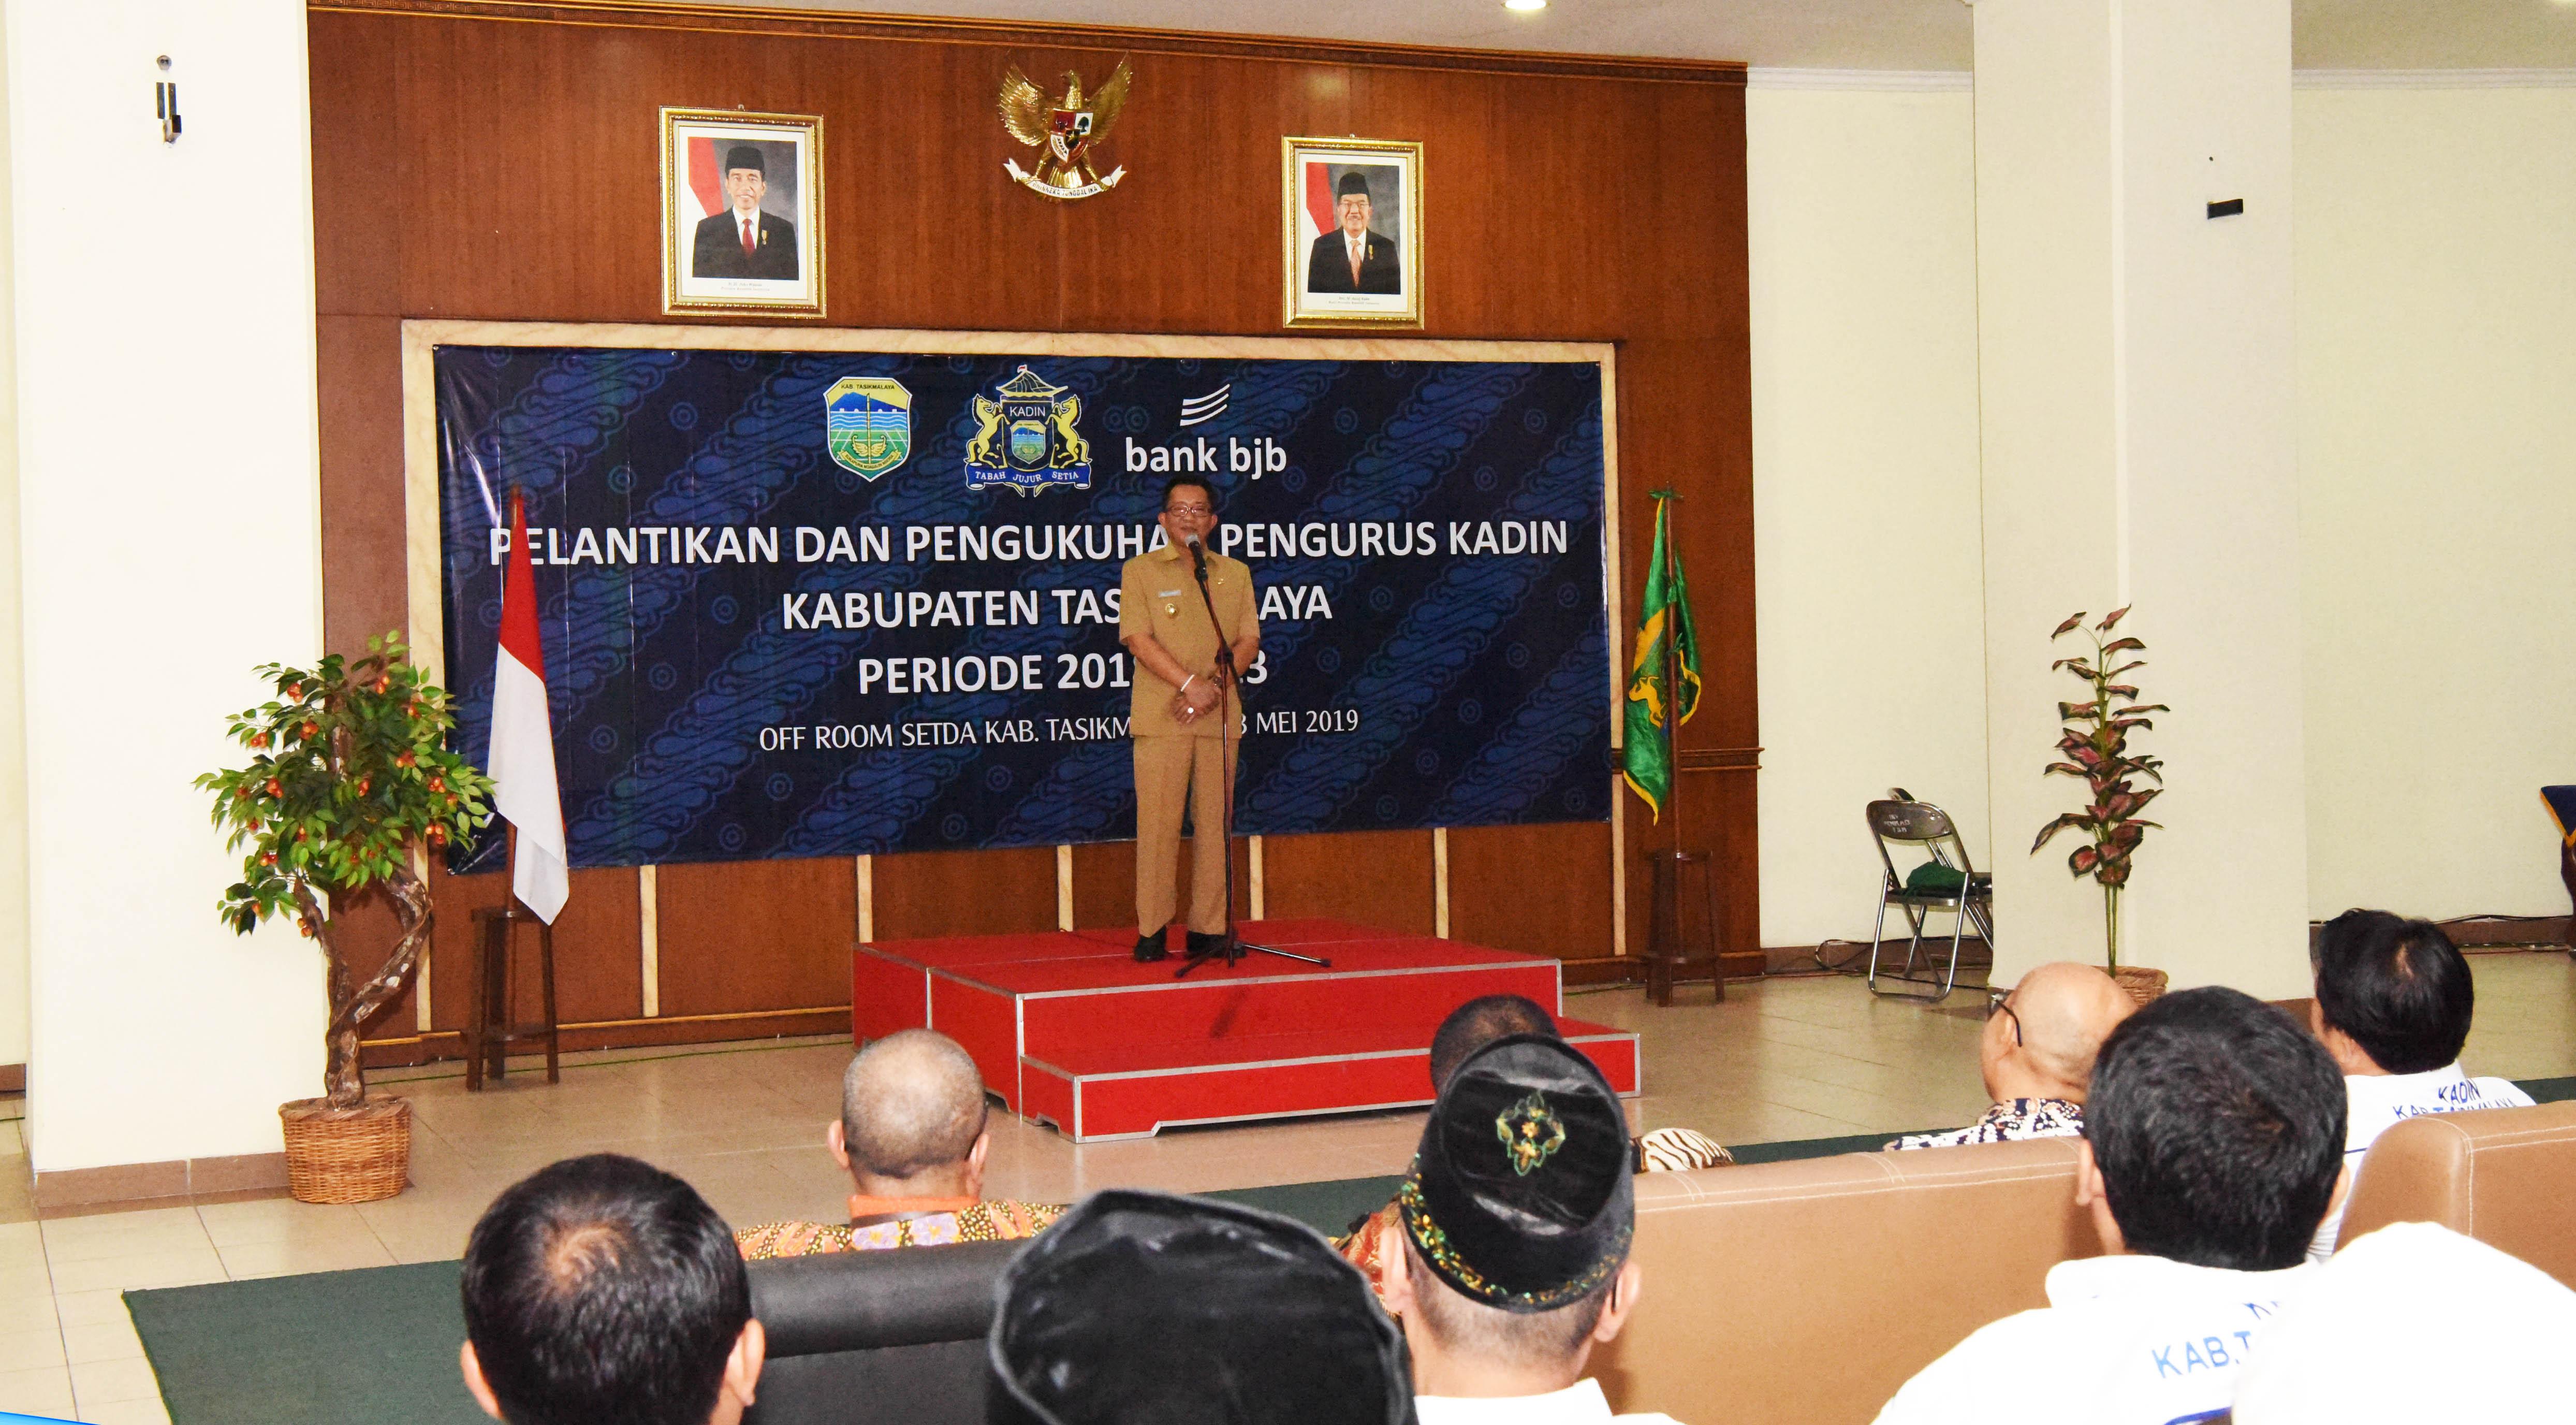 Bupatei Tasikmalaya H. Ade Sugianto, saat memberikan sambutan pada acara pengukuhan pengurus Kadin Kabupaten Tasikmalaya, senin,